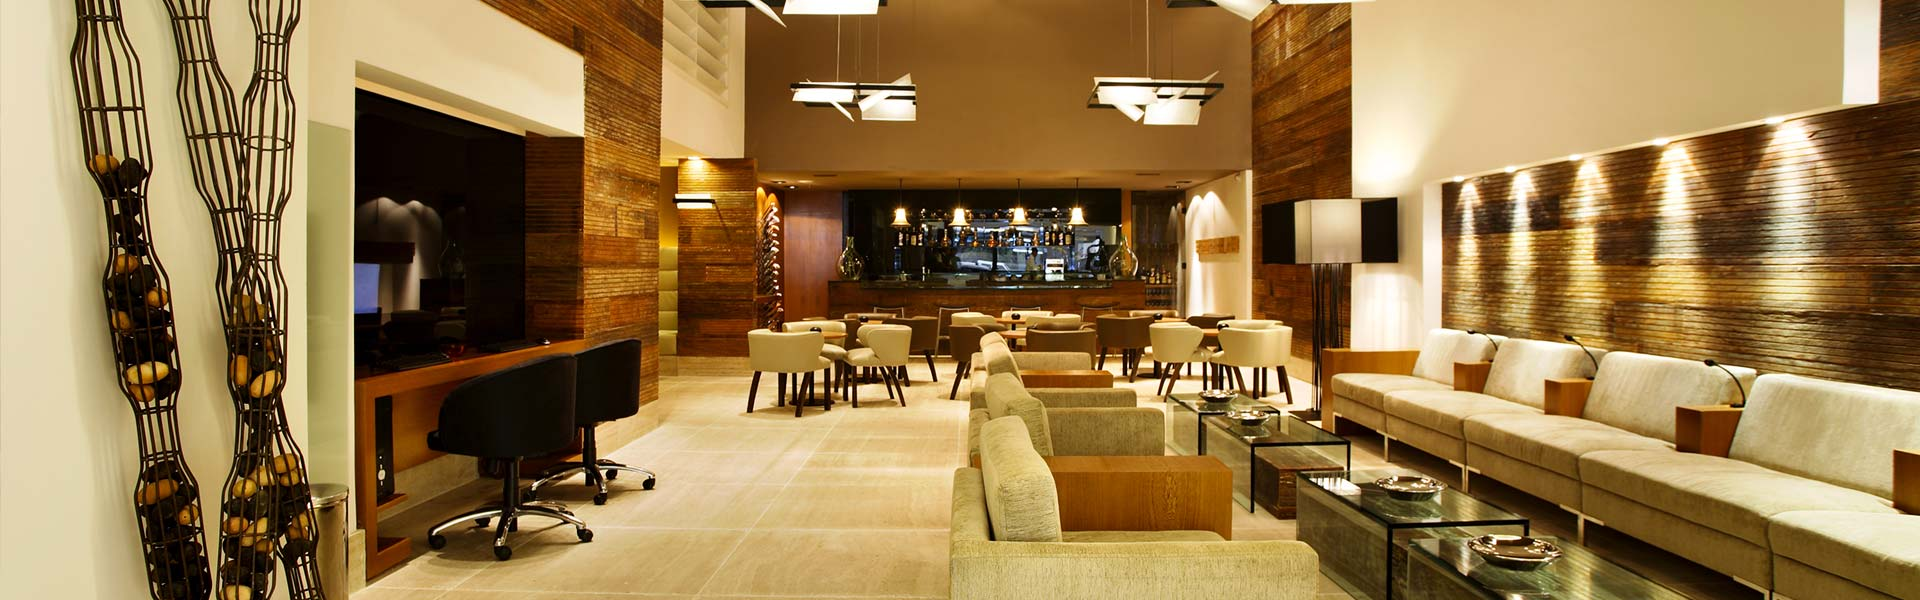 slider-page-ritz-plaza-hotel-leblon-lobby